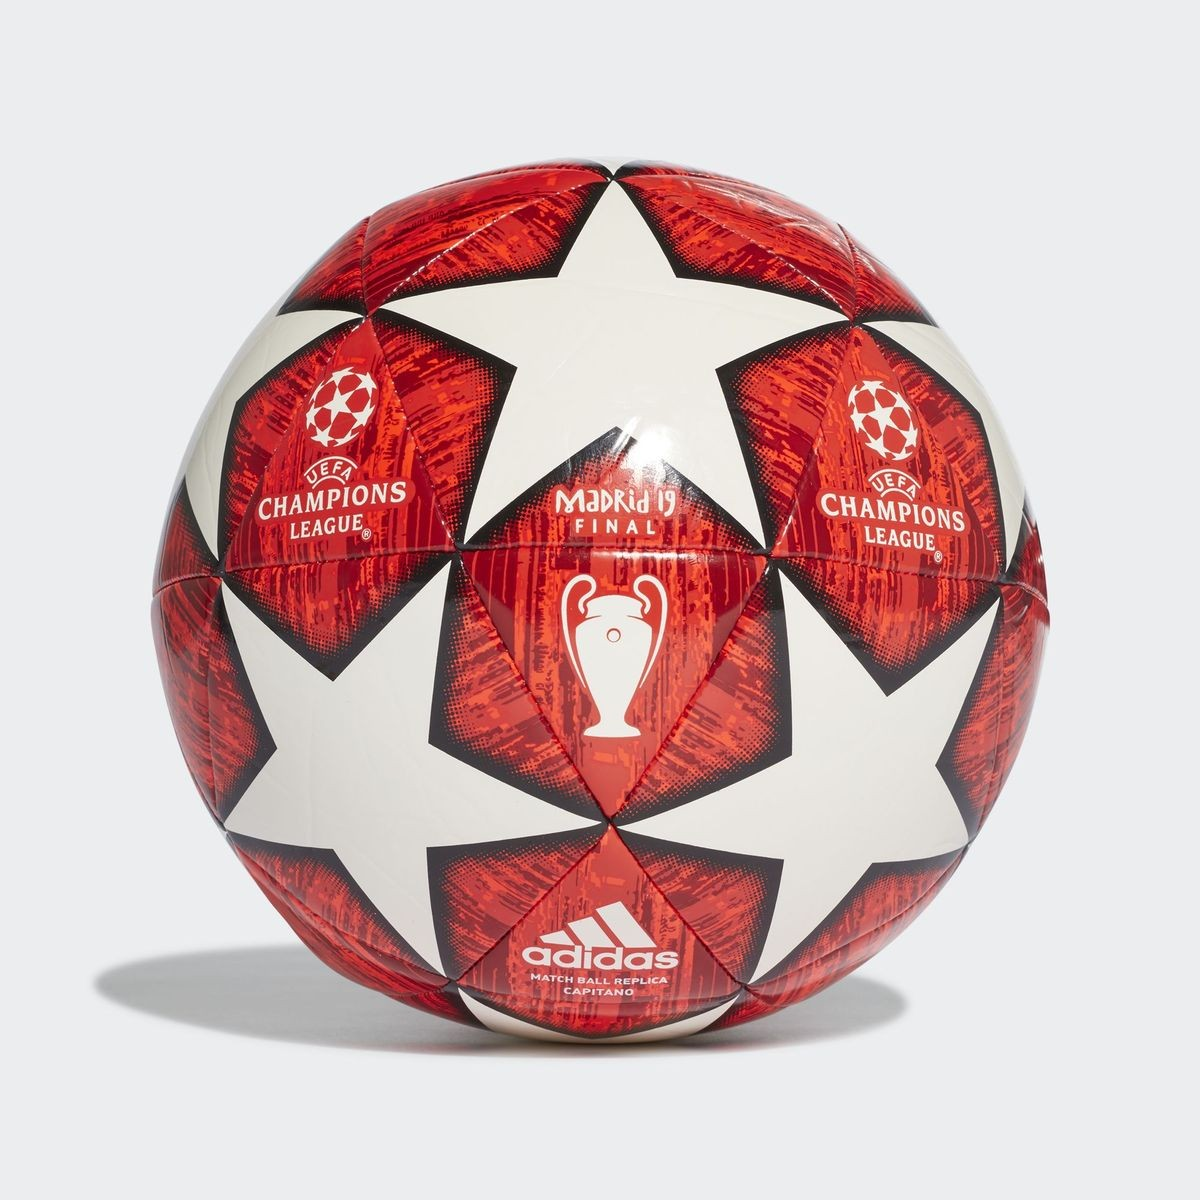 En Madrid Ballon Finale Ucl Capitano 2019Products Chaussure De yvmNn80wOP